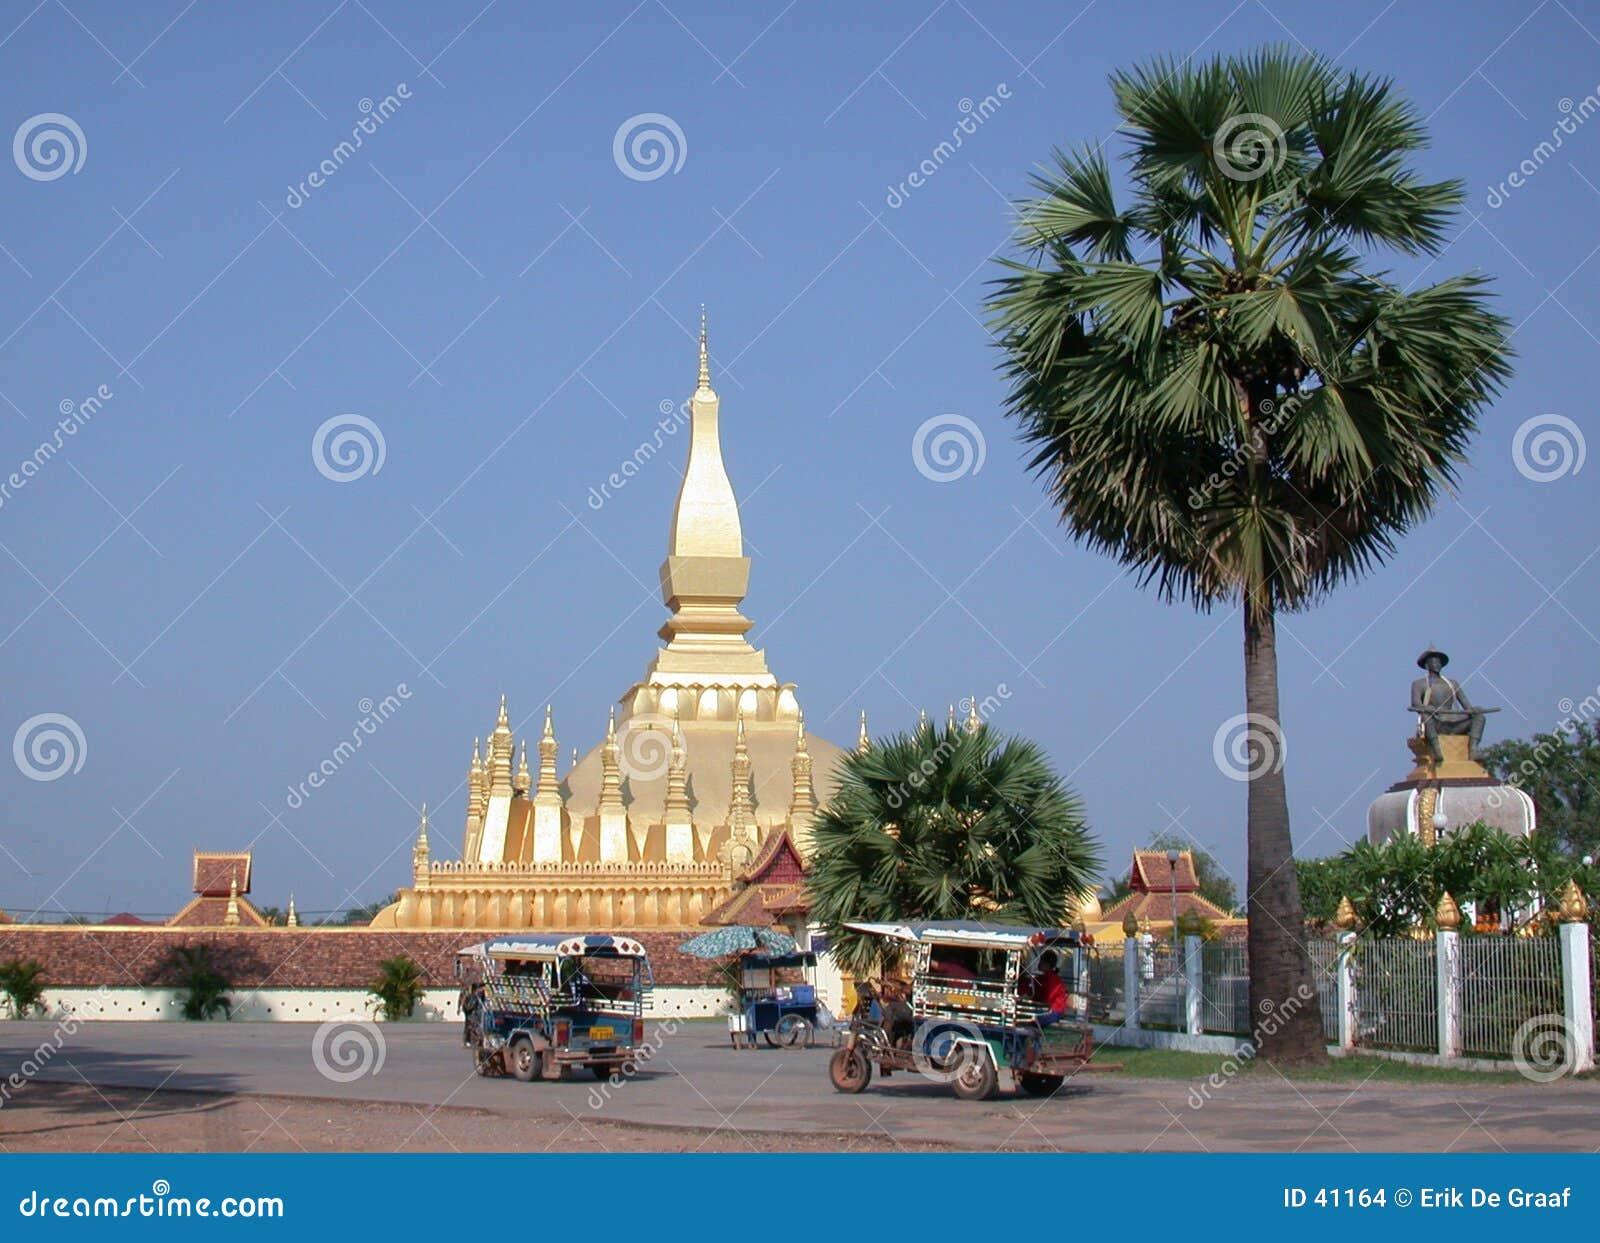 2 Laos stupa